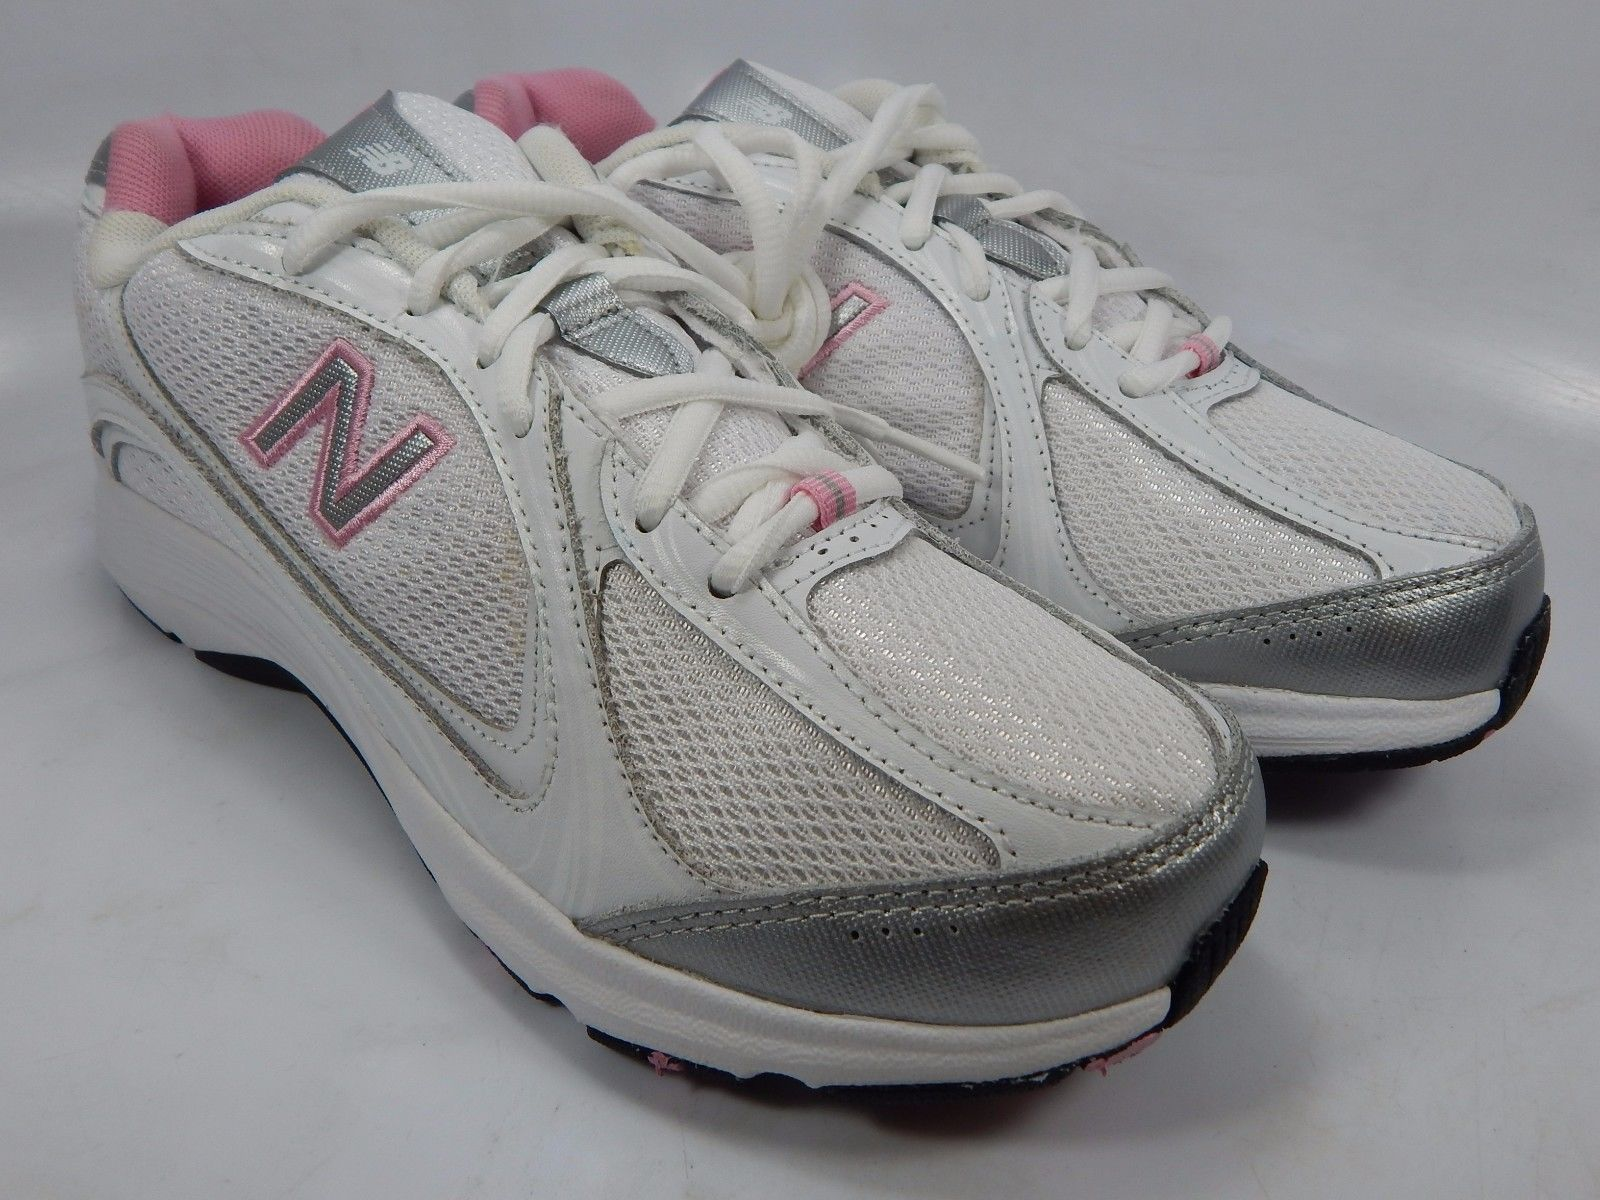 1fcbc45fc2c1 New Balance 496 Women s Walking Shoes Size US 8.5 M (B) EU 40 White Pink  WW496WP